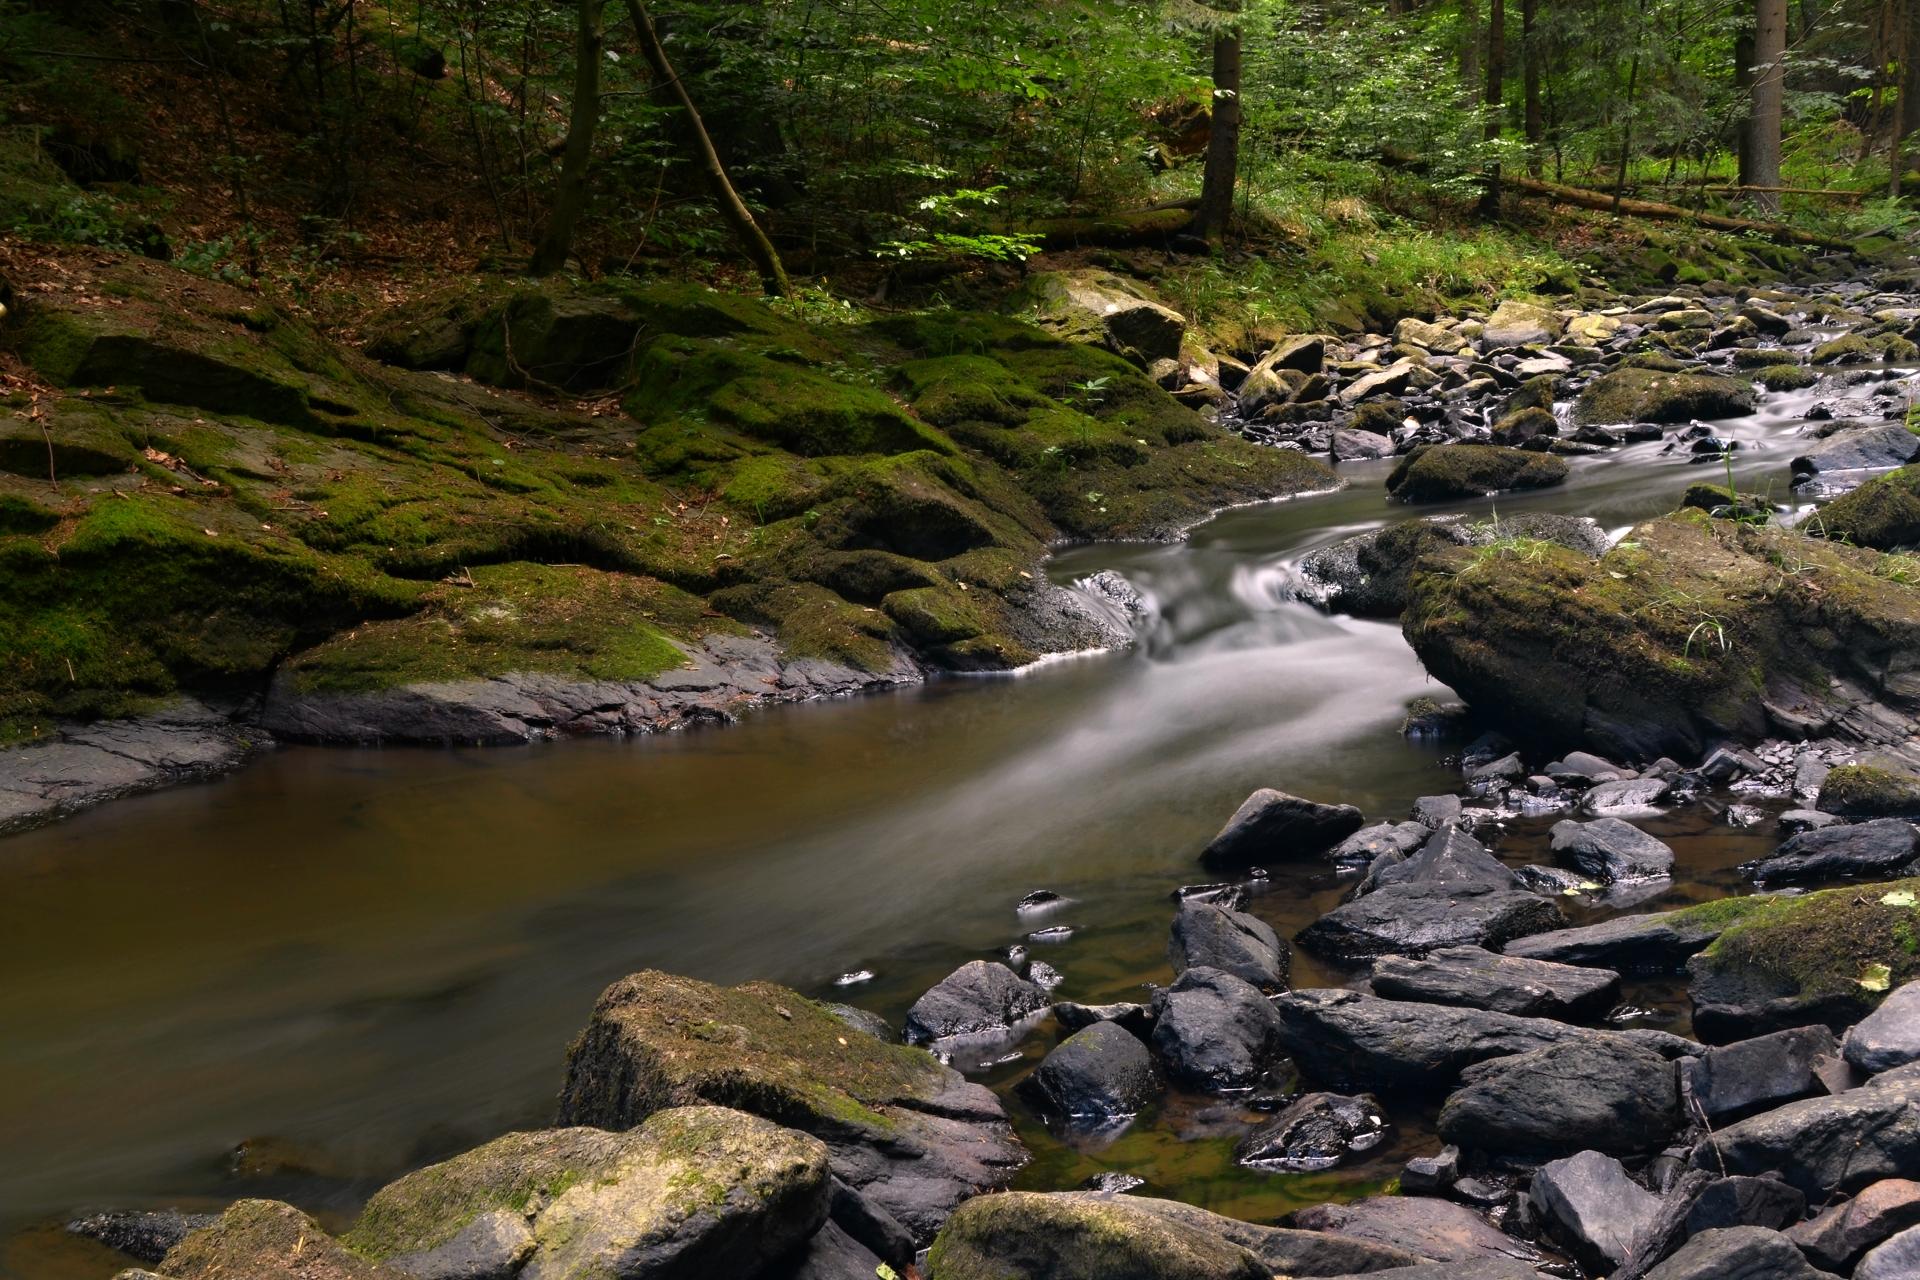 Voda zrychluje po kamenech